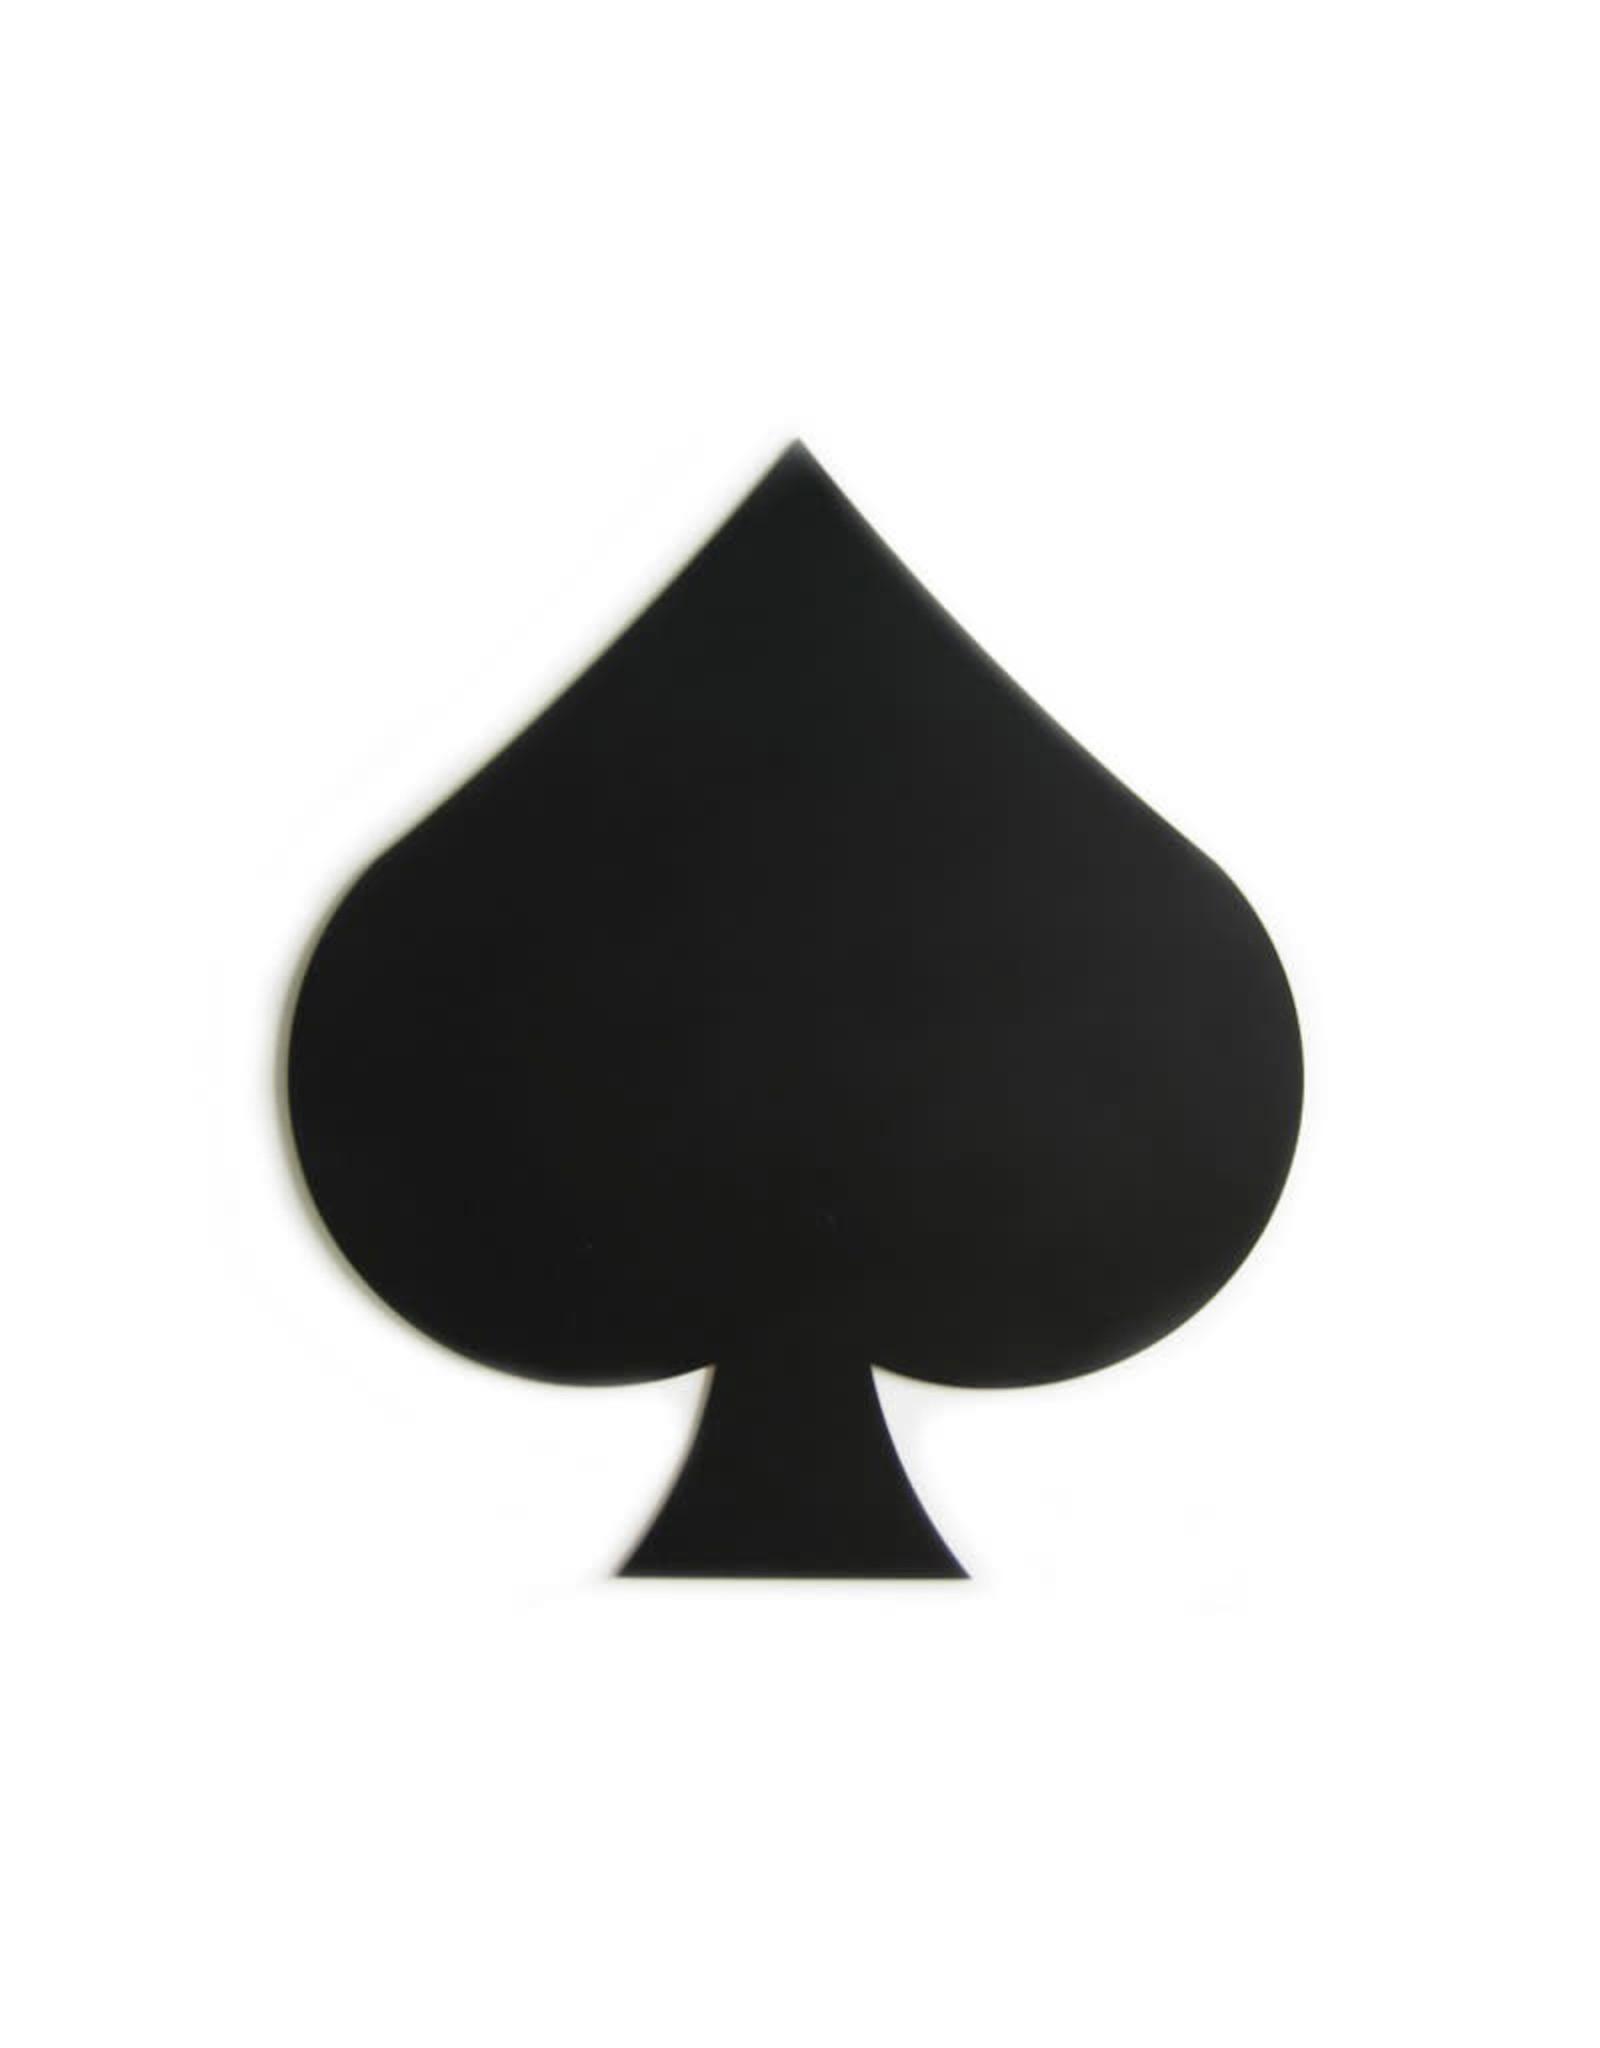 Harder & Steenbeck Harder & Steenbeck Spades Dimensions: 40 x 46 cm